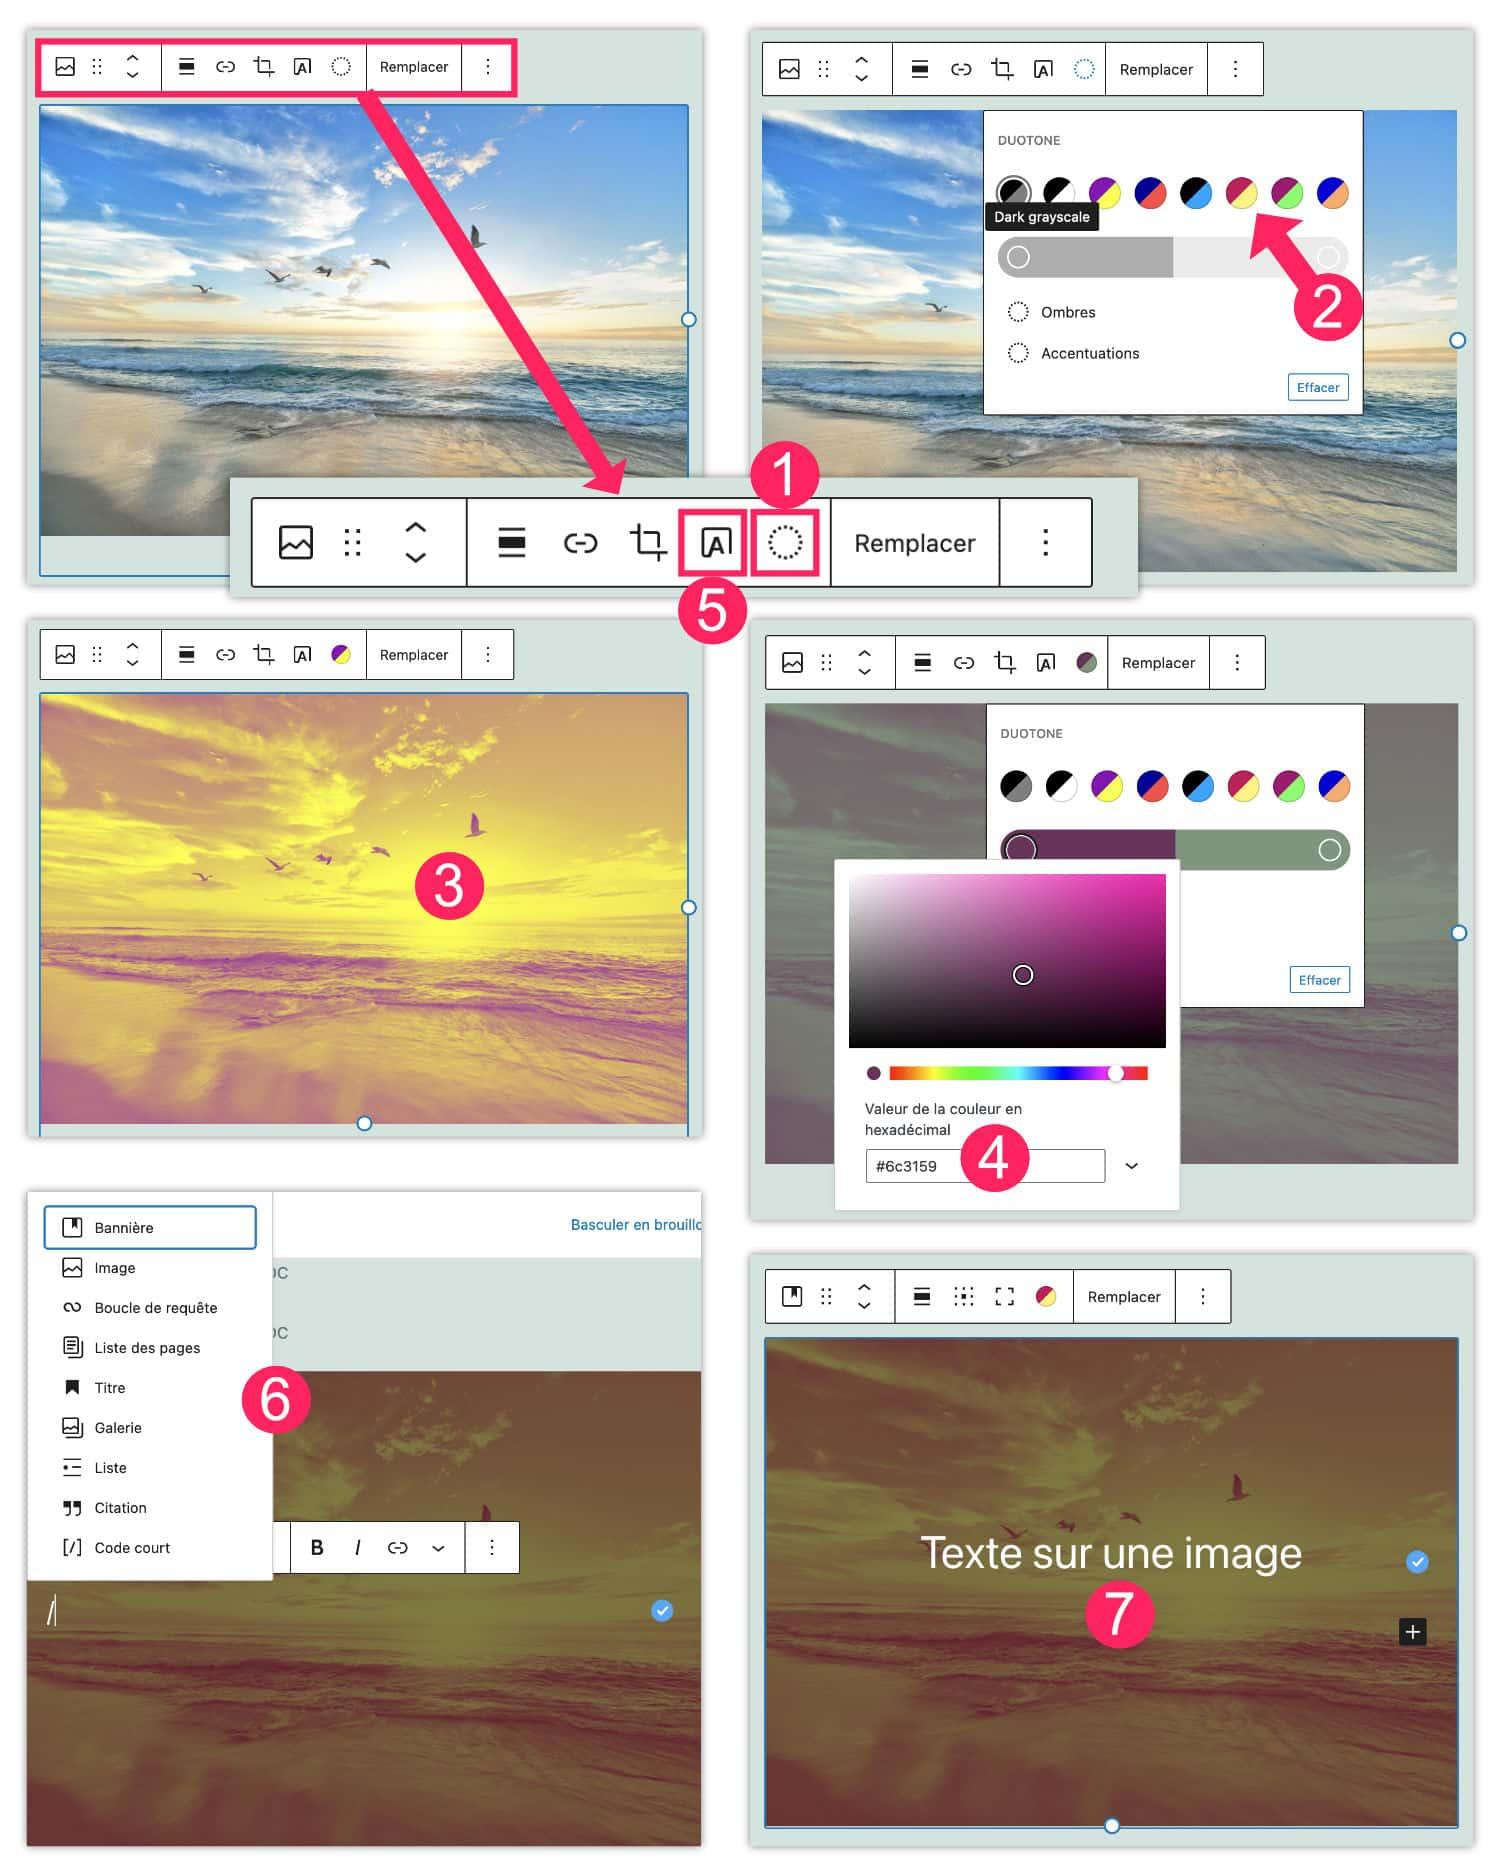 filtres images texte